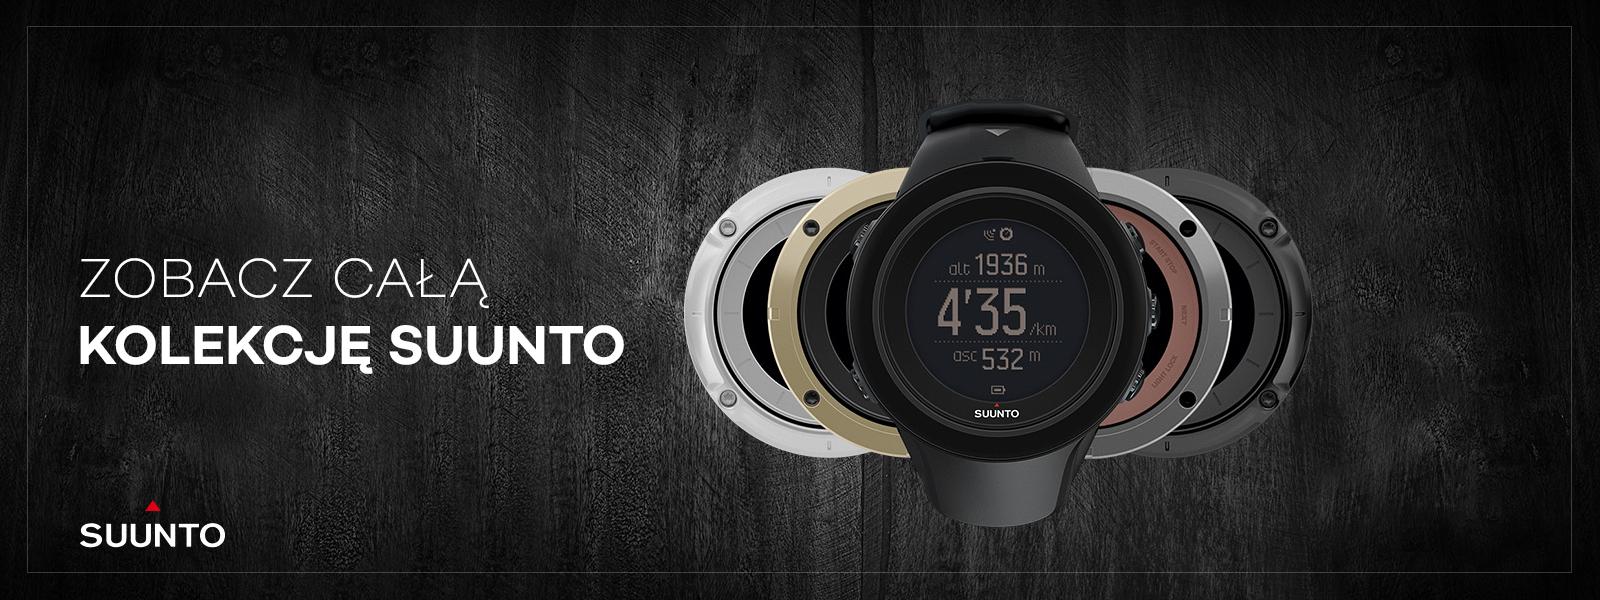 Kolekcja zegarków Suunto